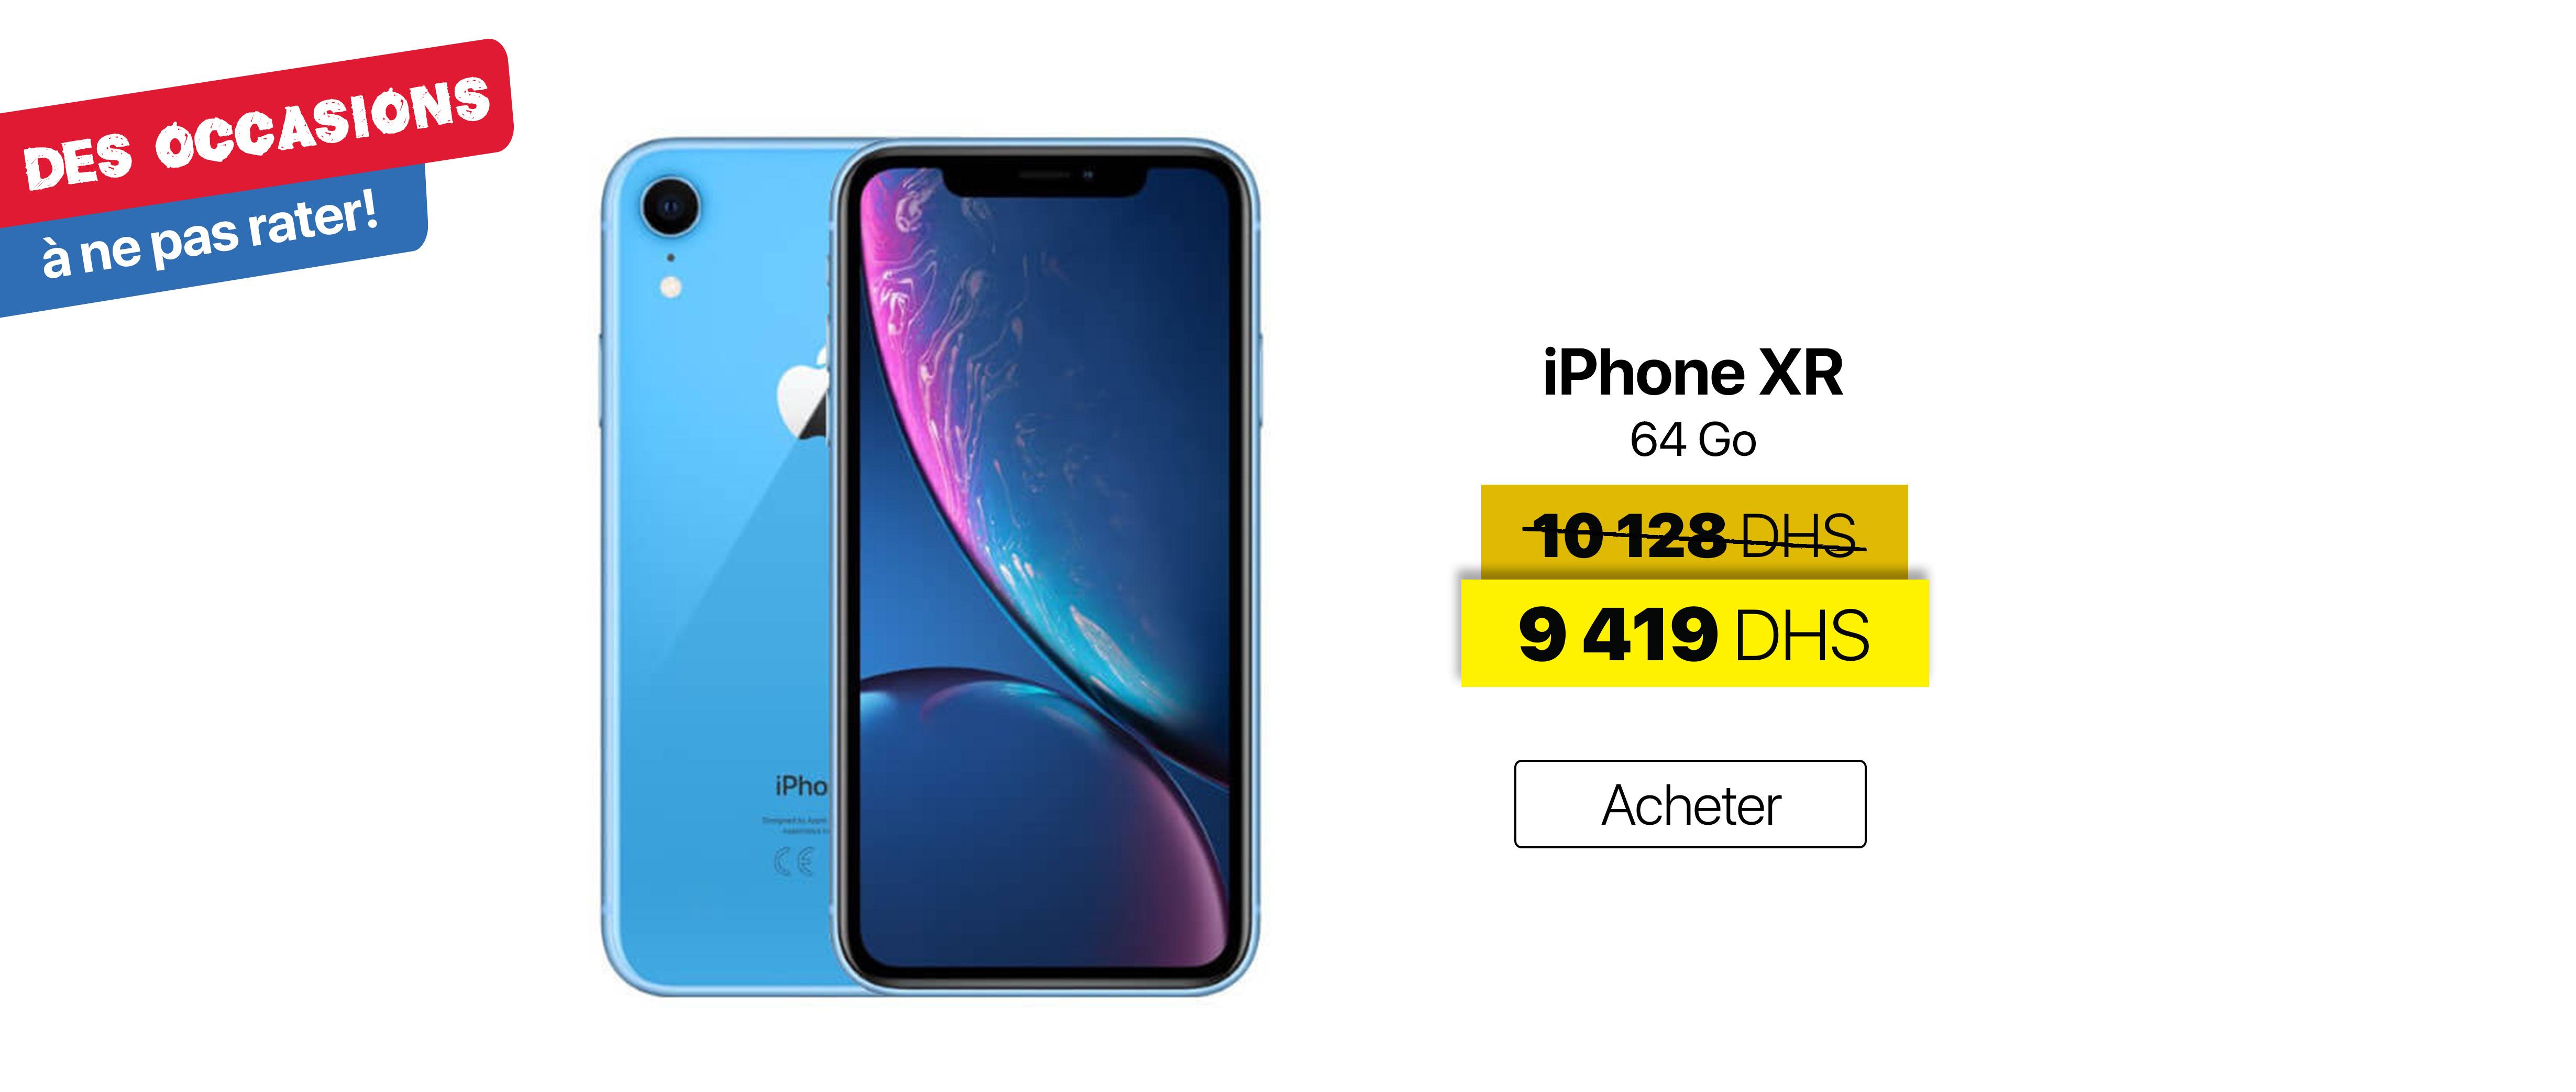 iPhone XR offer